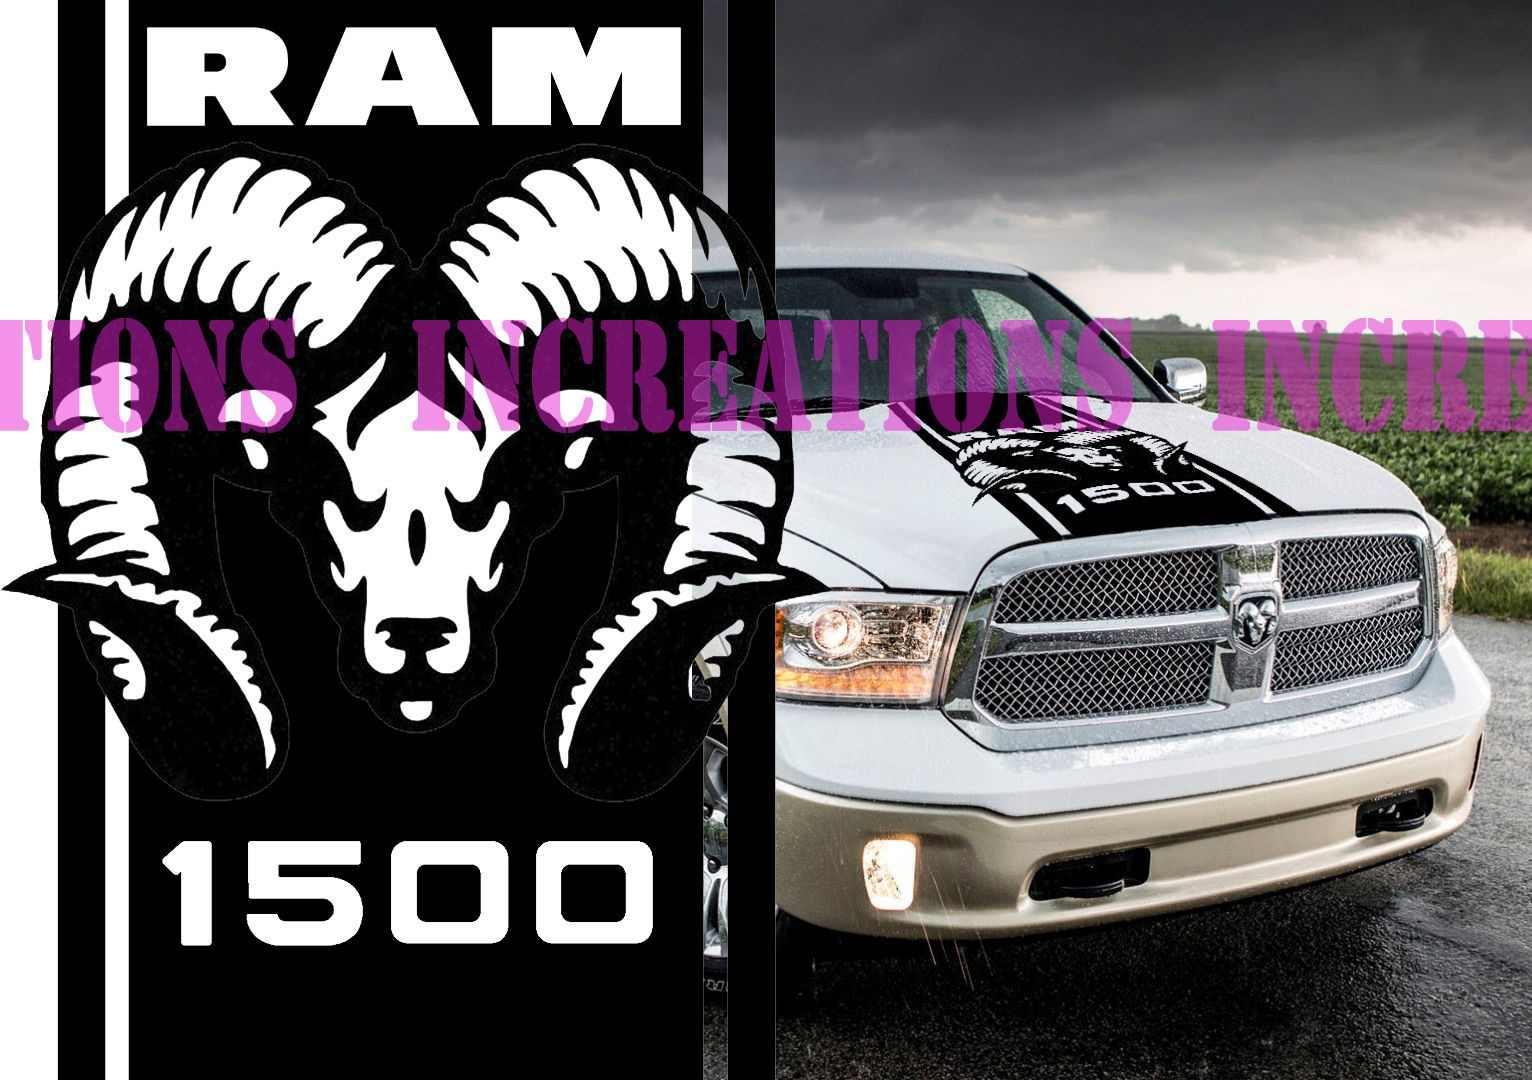 For Universal Hemi Dodge Ram 1500 Hood Stripe Truck Decals Mopar Stickers Vynil Car Graphics Car Stickers Aliexpress